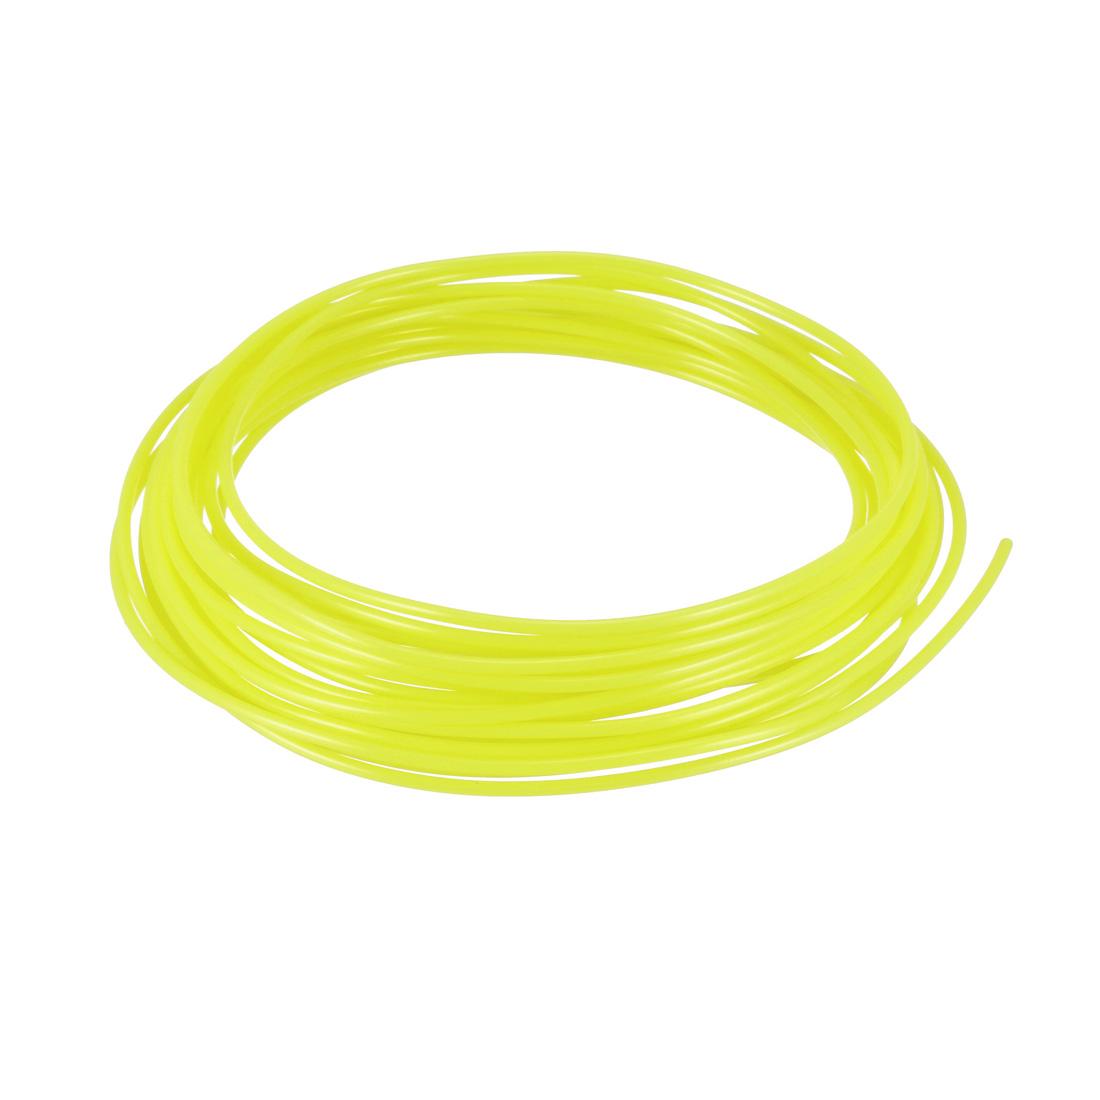 5 Meter/16 Ft PLA 3D Pen/3D Printer Filament, 1.75 mm Fluorescent Yellow